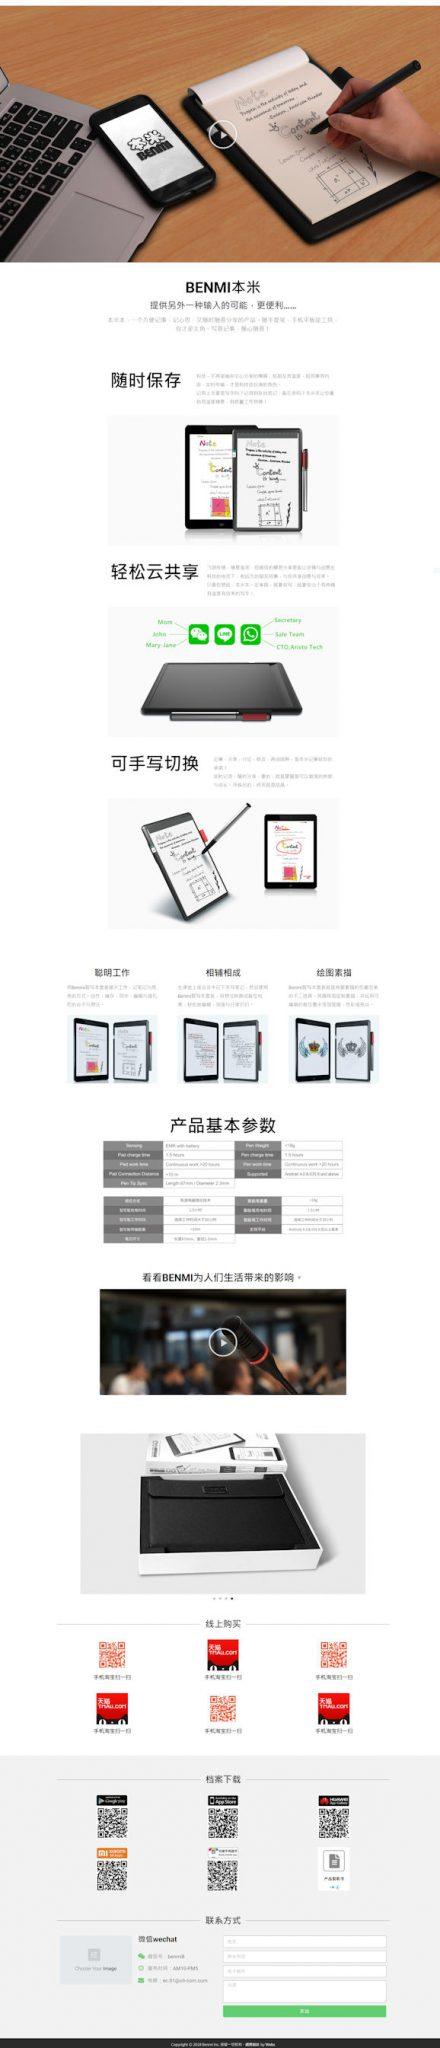 網頁設計-智寫本1